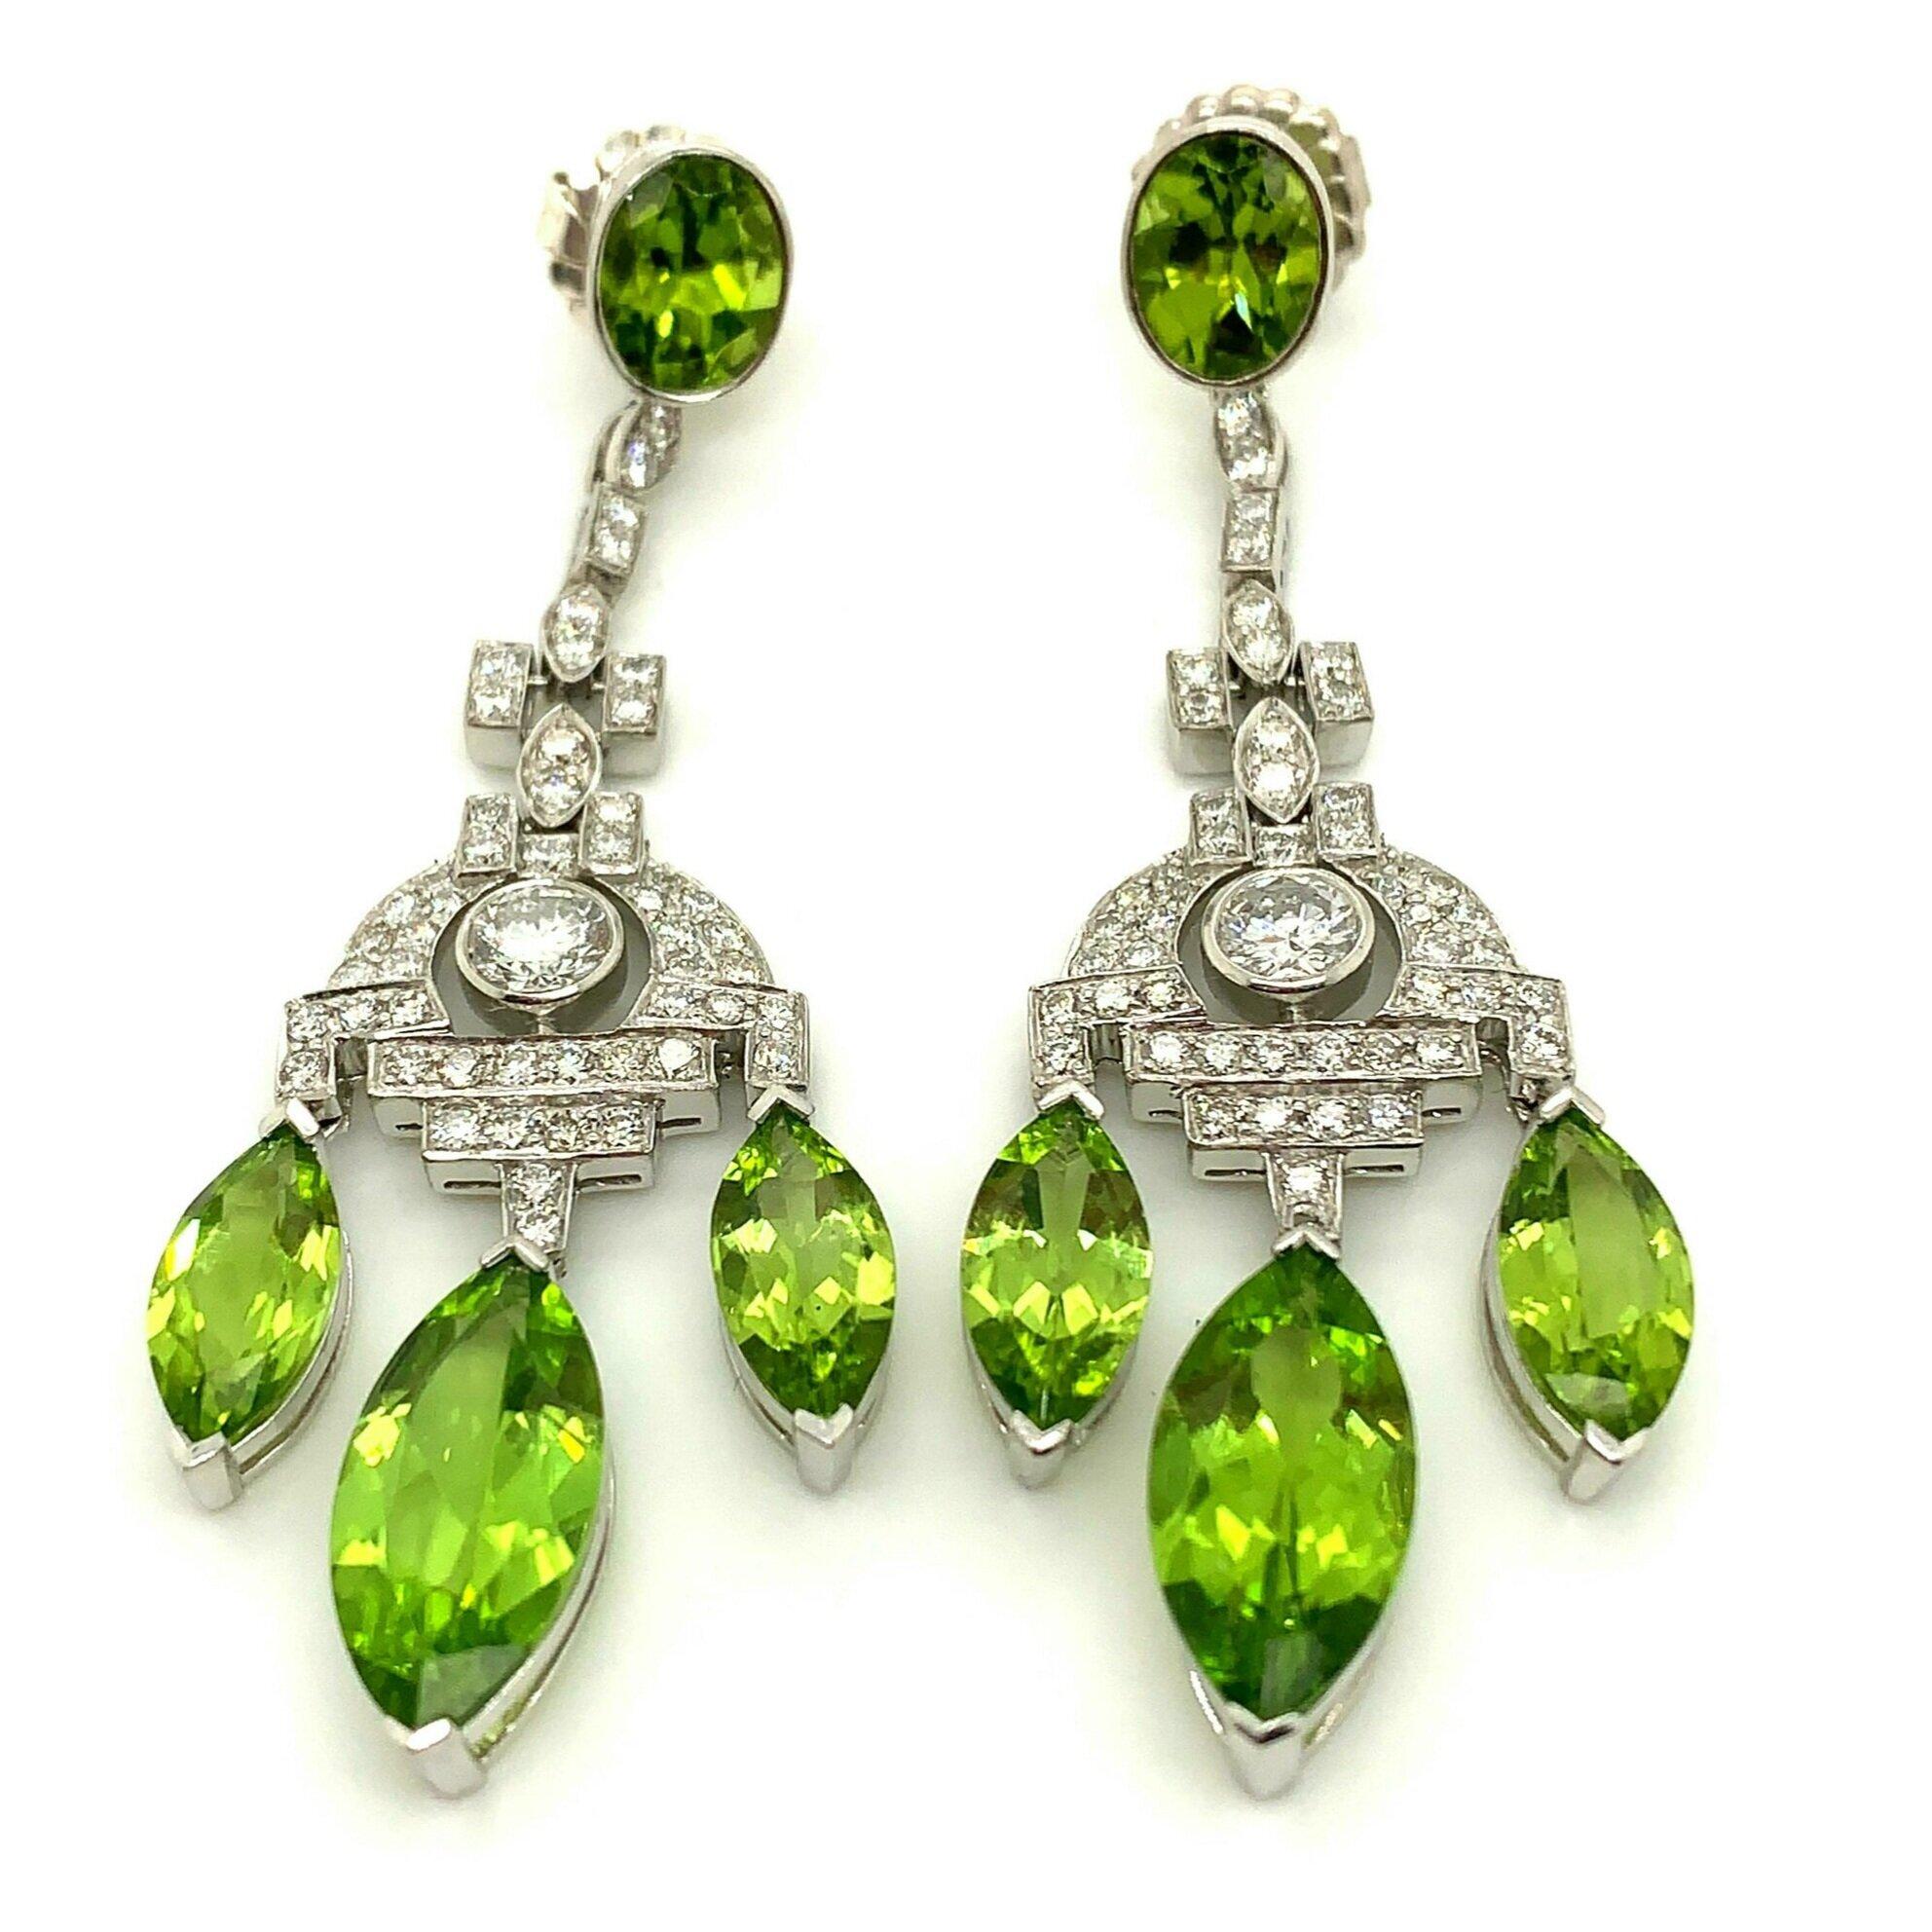 Peridot and Diamond Earrings   Est. US$ 2,500-3,500